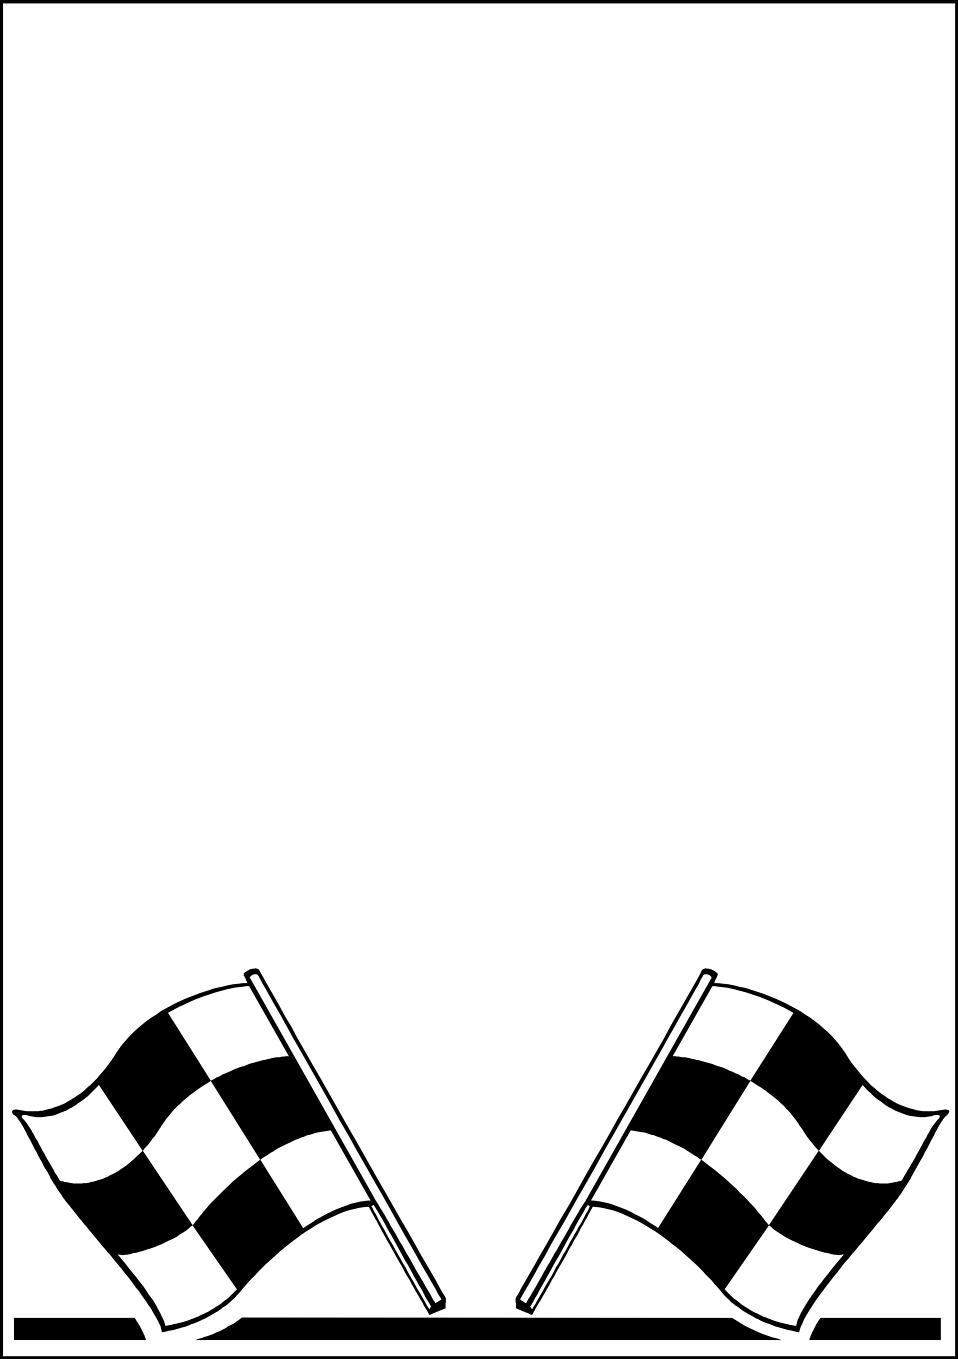 Free Race Border Cliparts, Download Free Clip Art, Free Clip.